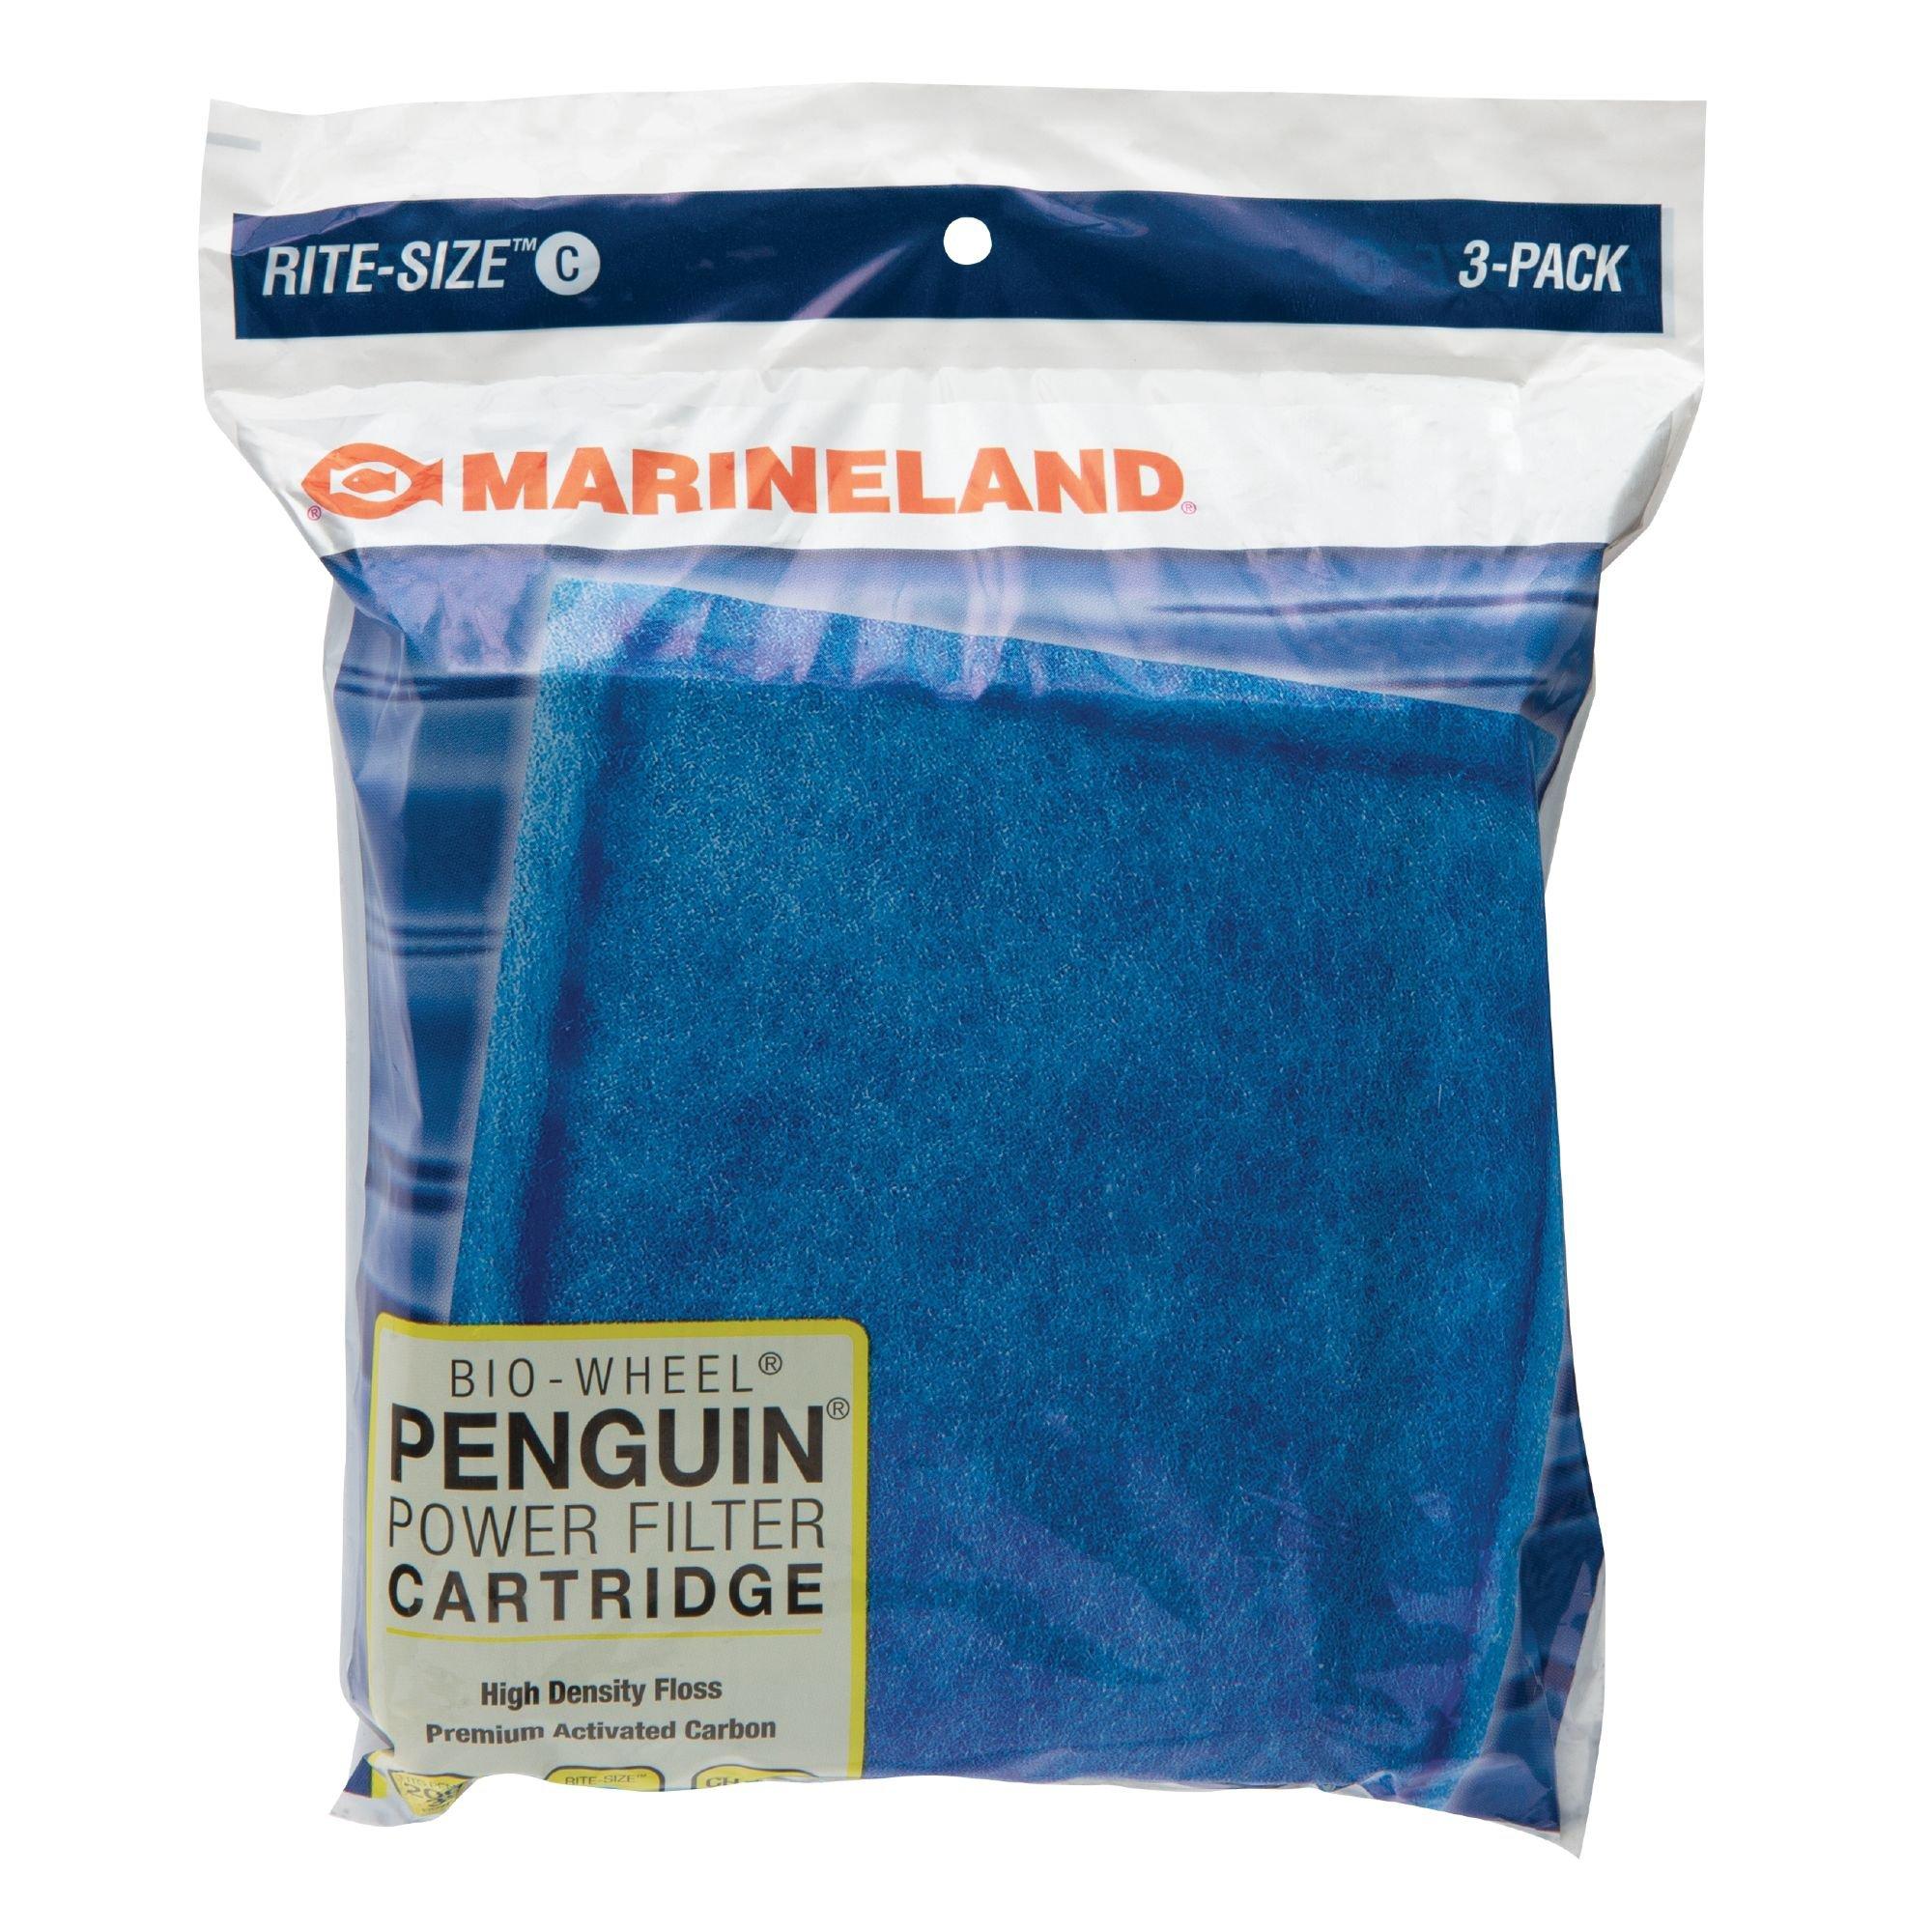 Marineland Rite-Size Bonded Filter Sleeve for Penguin 200/350